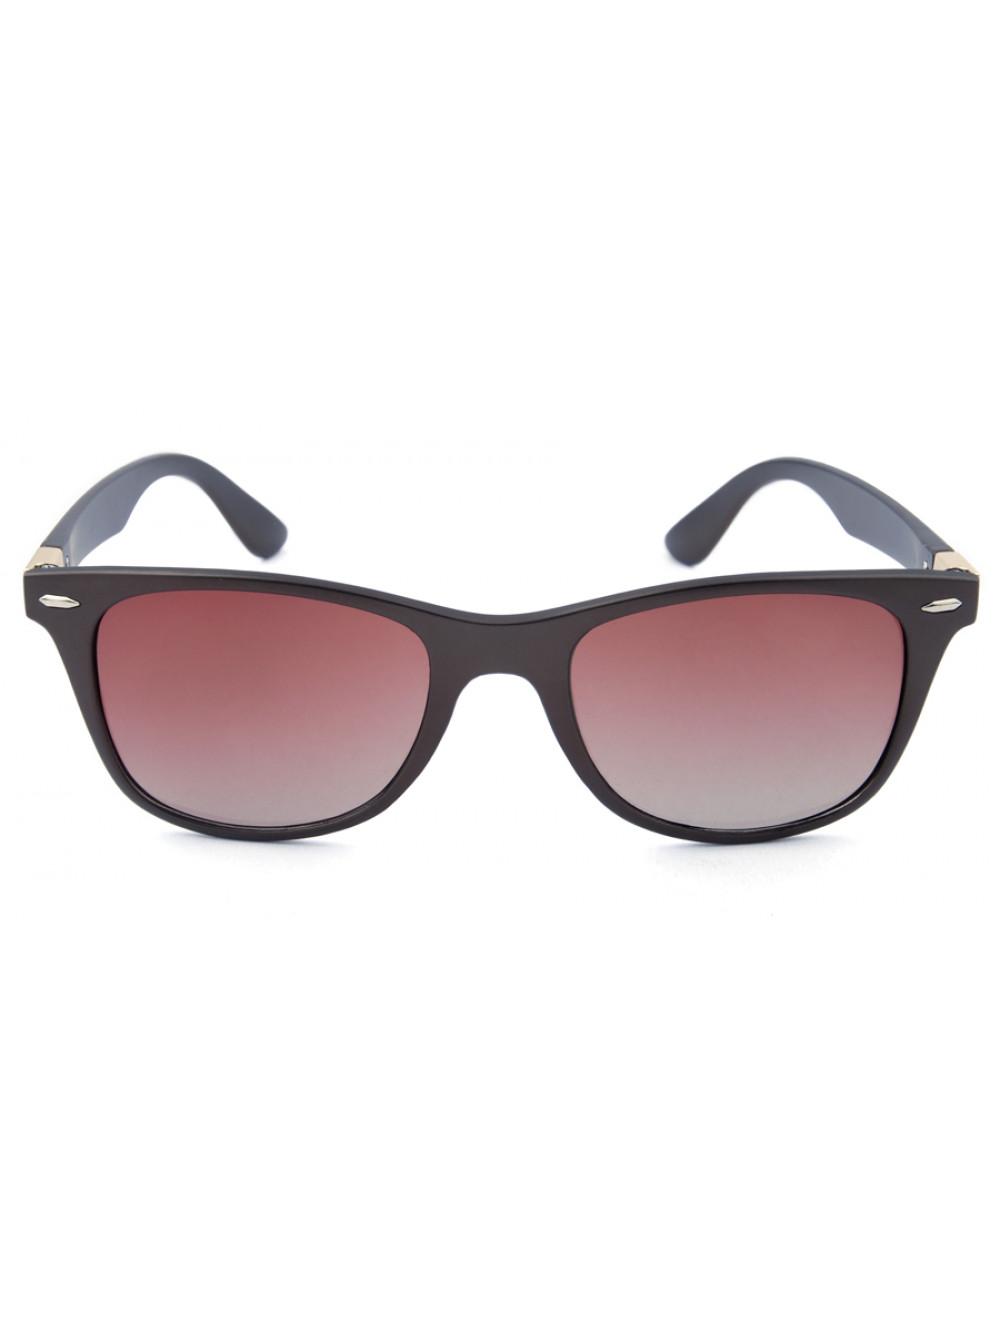 Slnečné okuliare Premium Cofee polarizačné c26113283f1